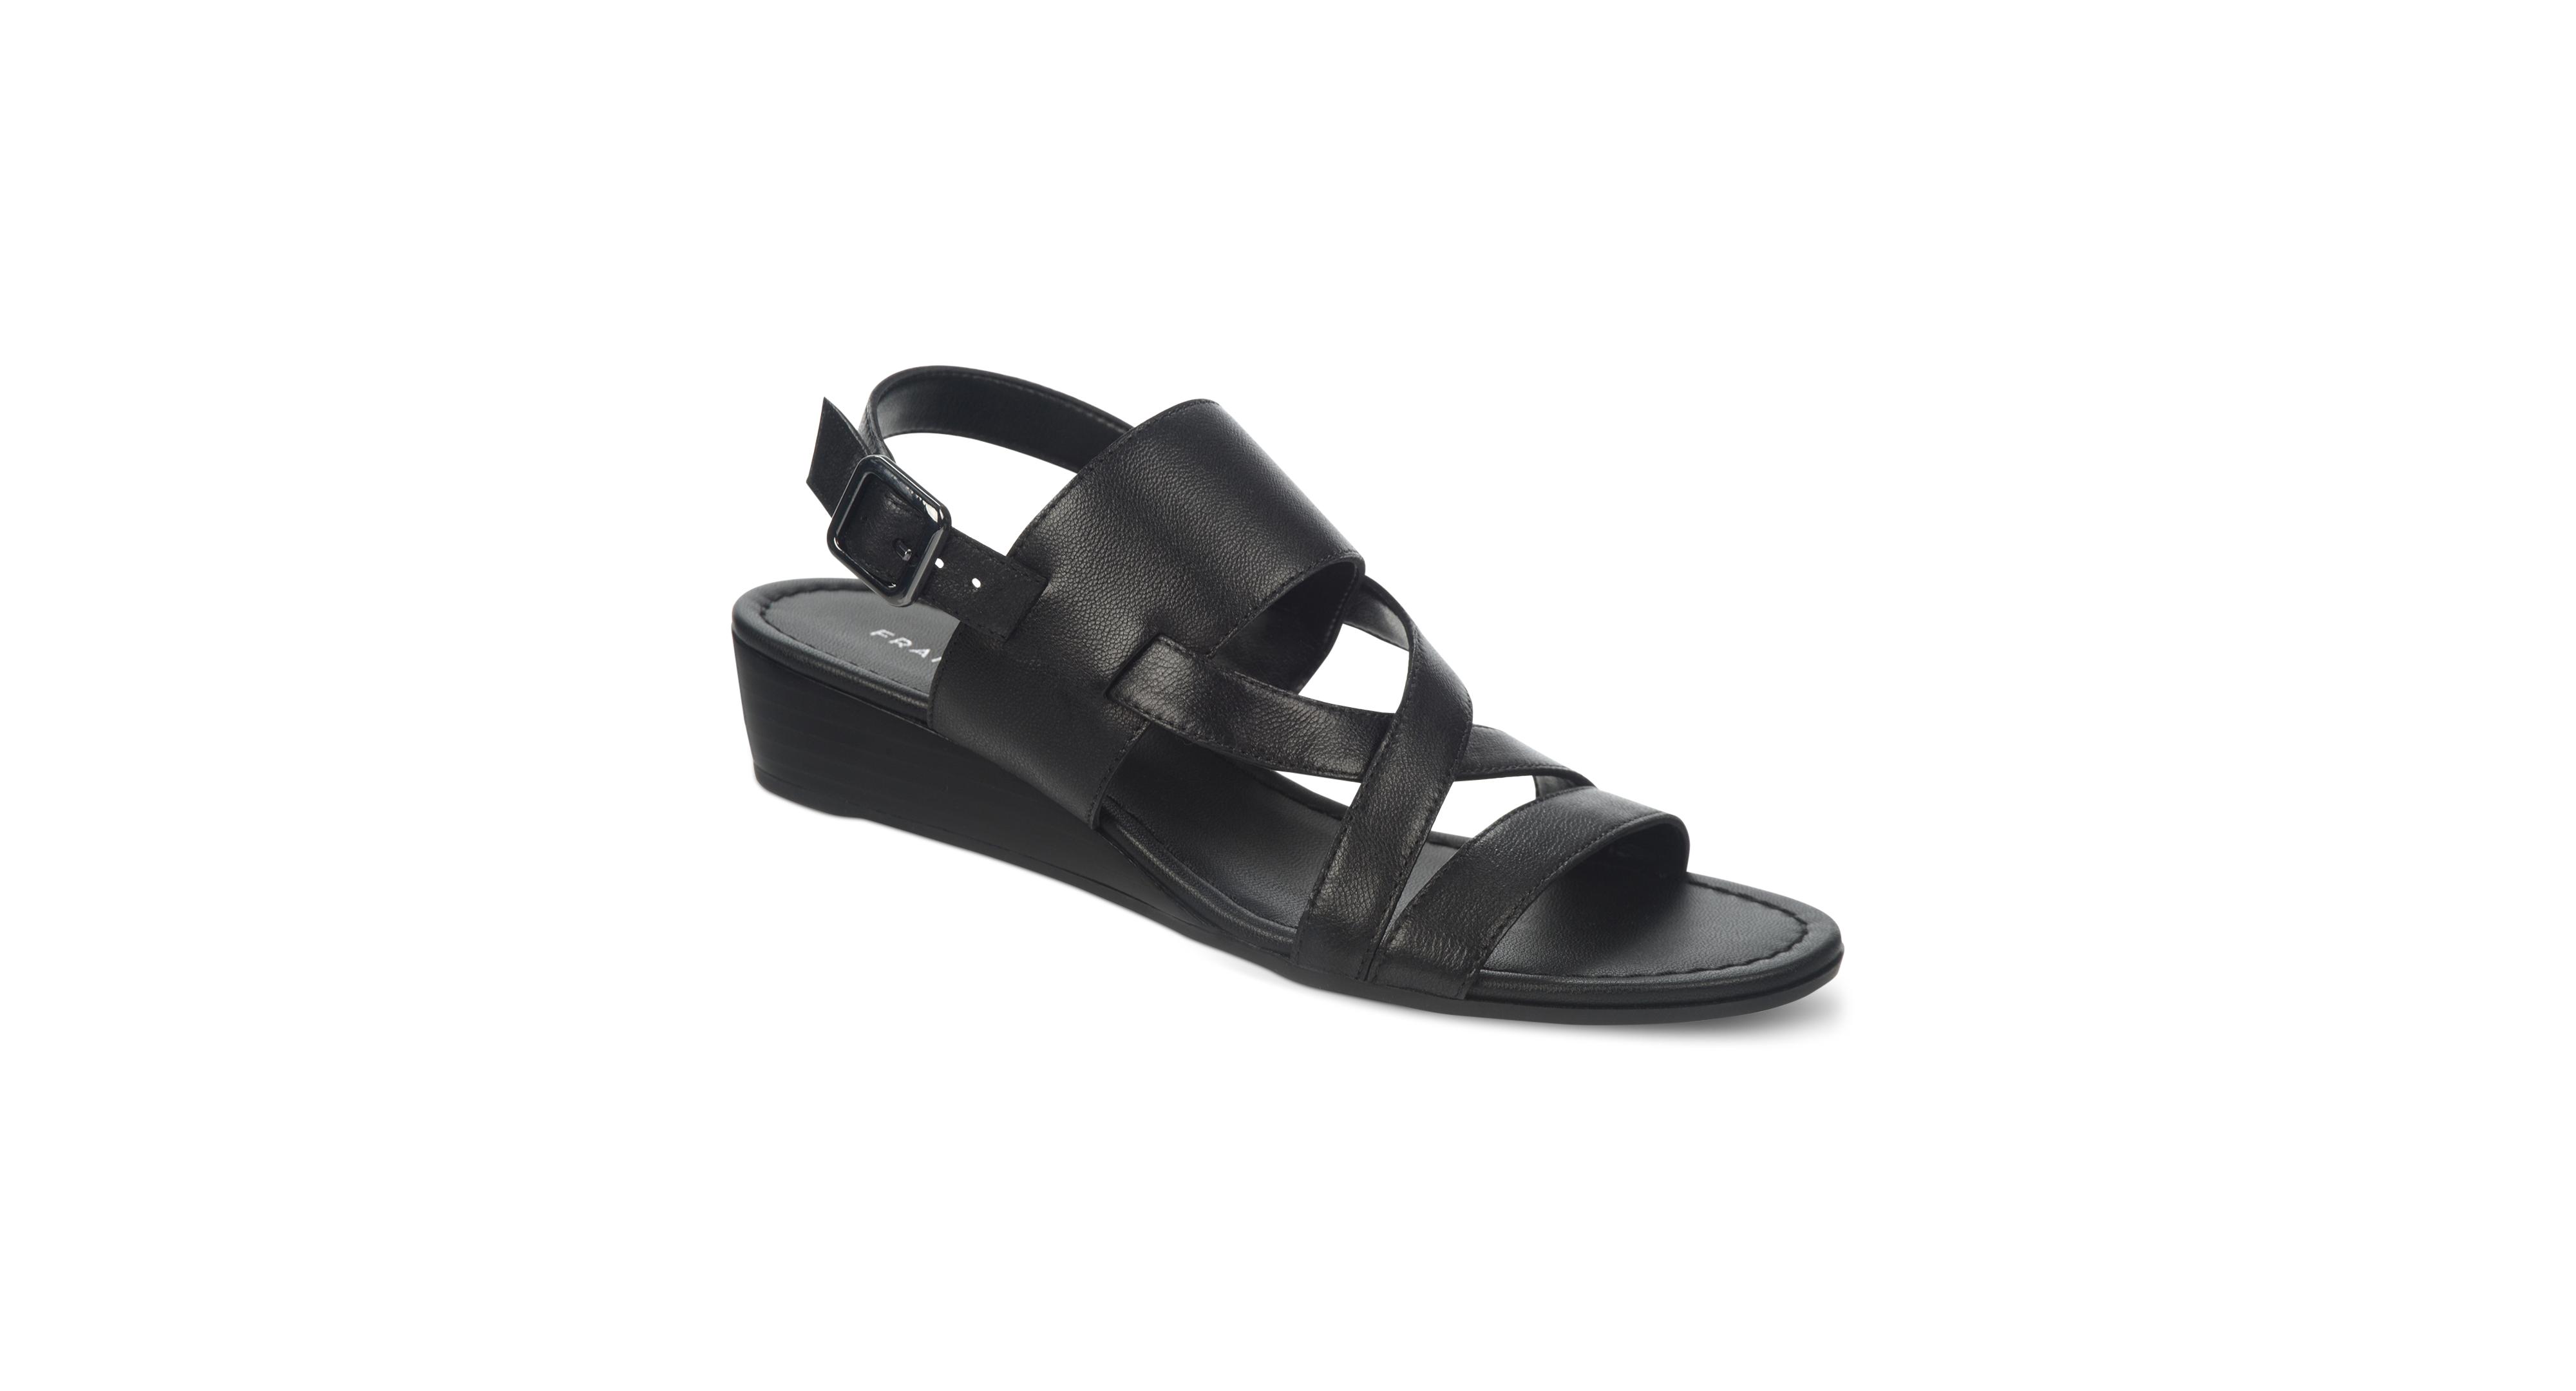 Womens High Heels Franco Sarto Caliari Demi Wedge Sandals Womens Shoes Heels Outlet Online